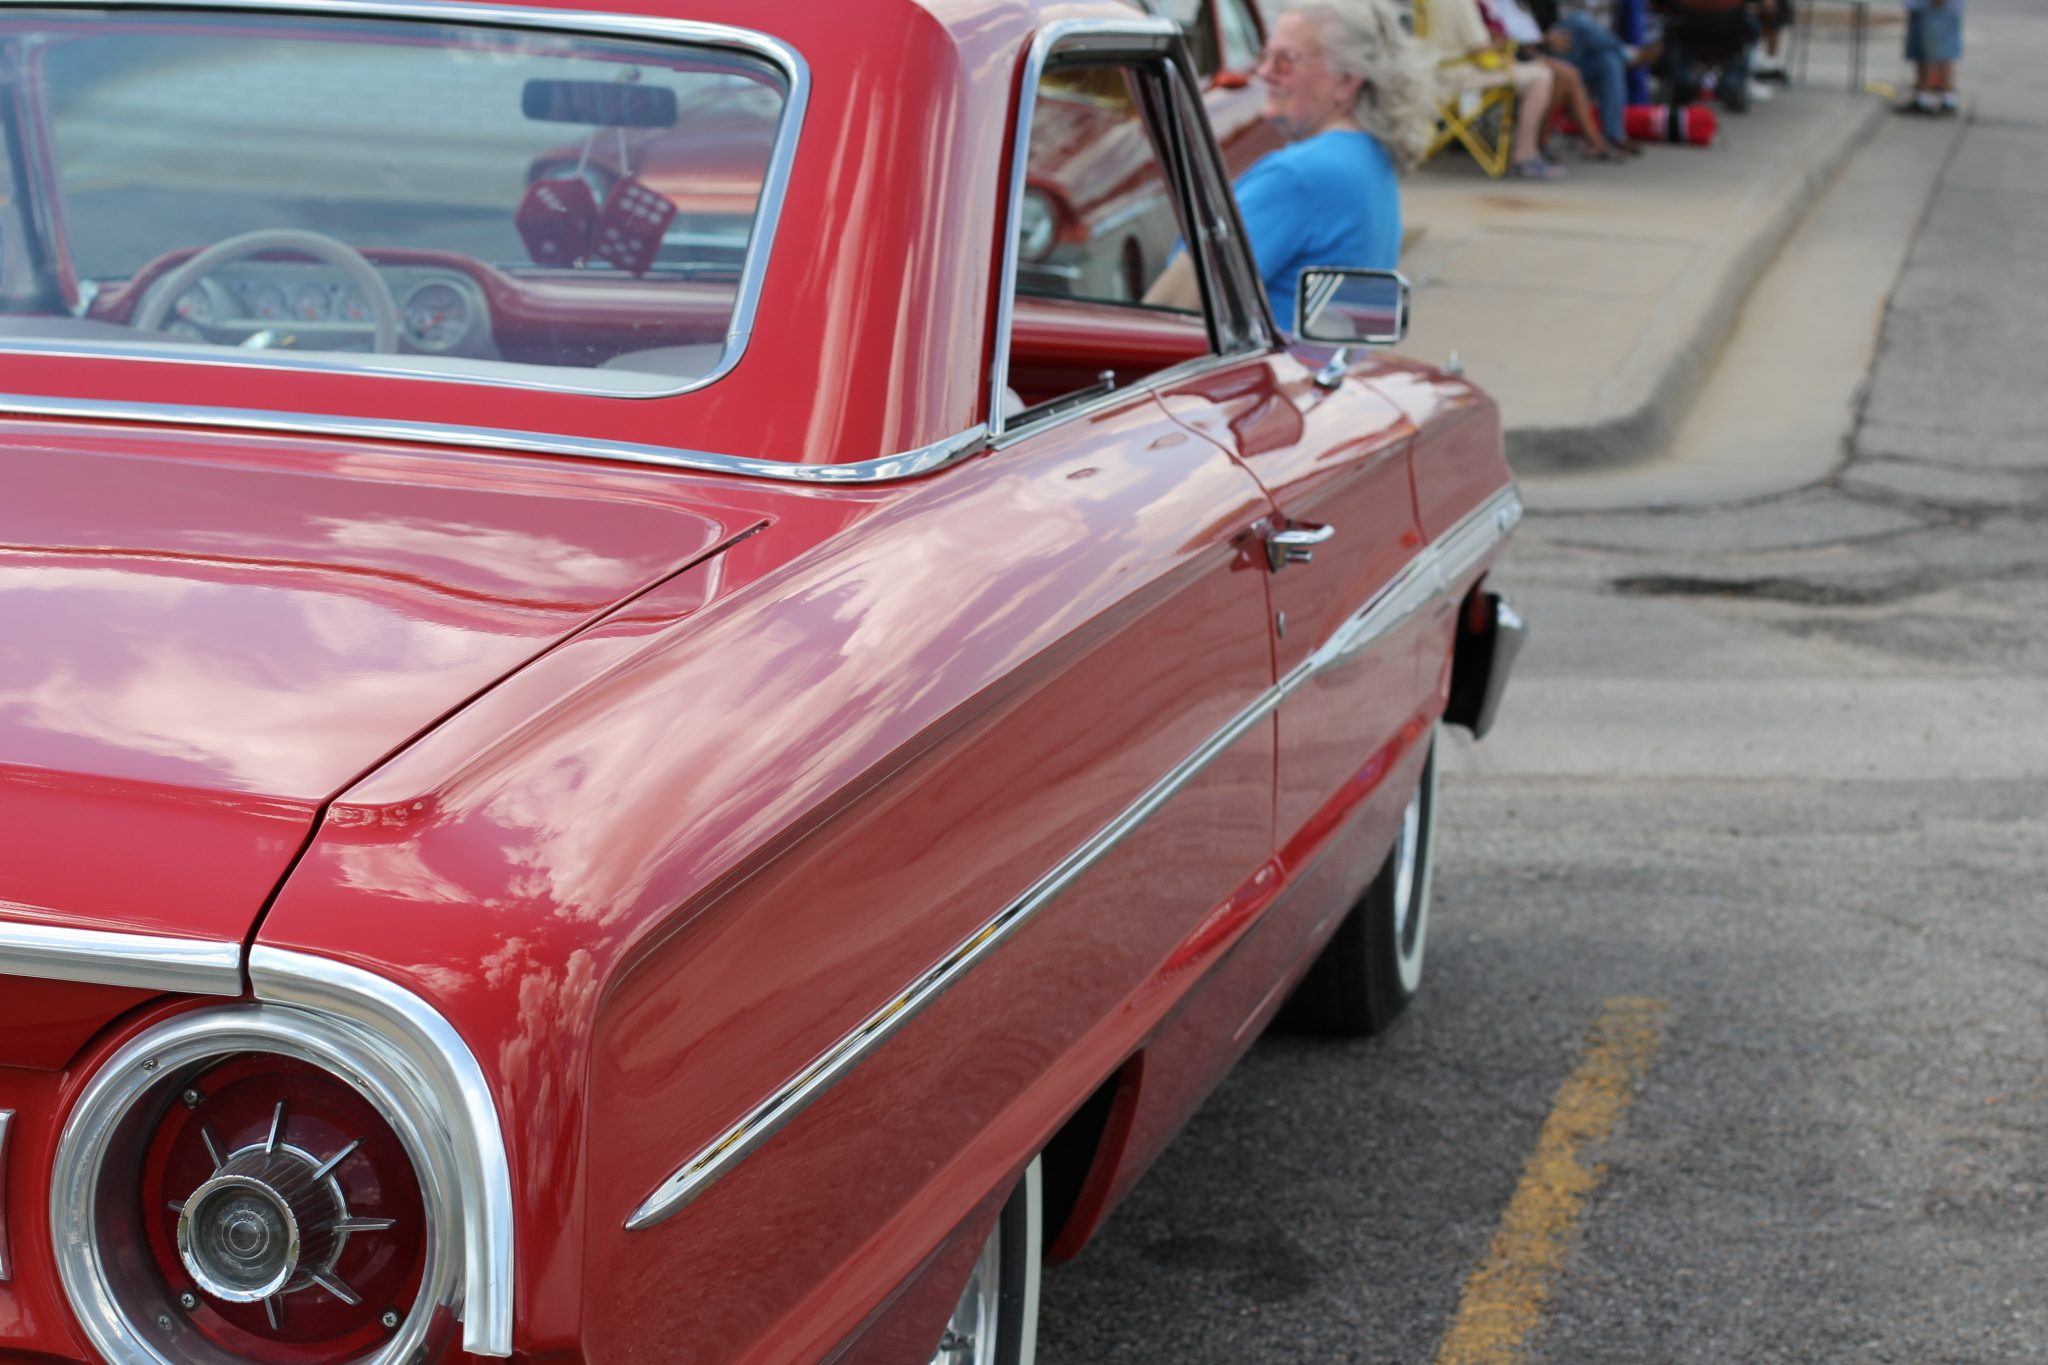 Used Cars Wichita Ks >> Car Show Pics Near in Wichita, Kansas